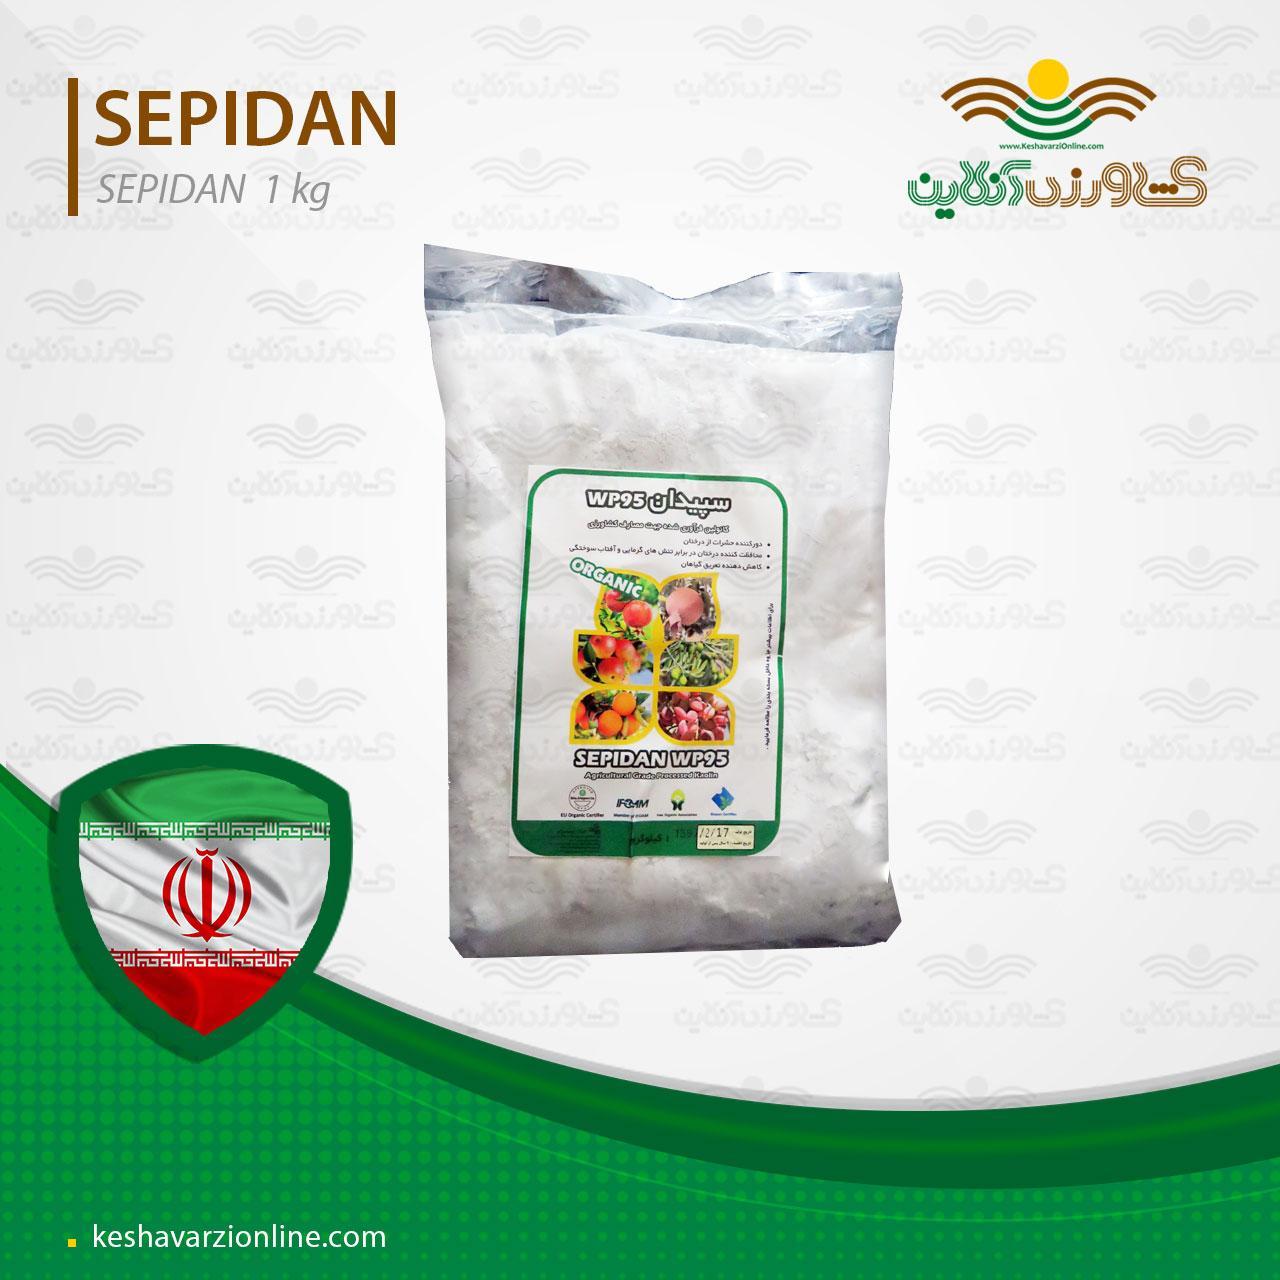 سم سپیدان یا پودر کایولین و روش مصرف سپیدان